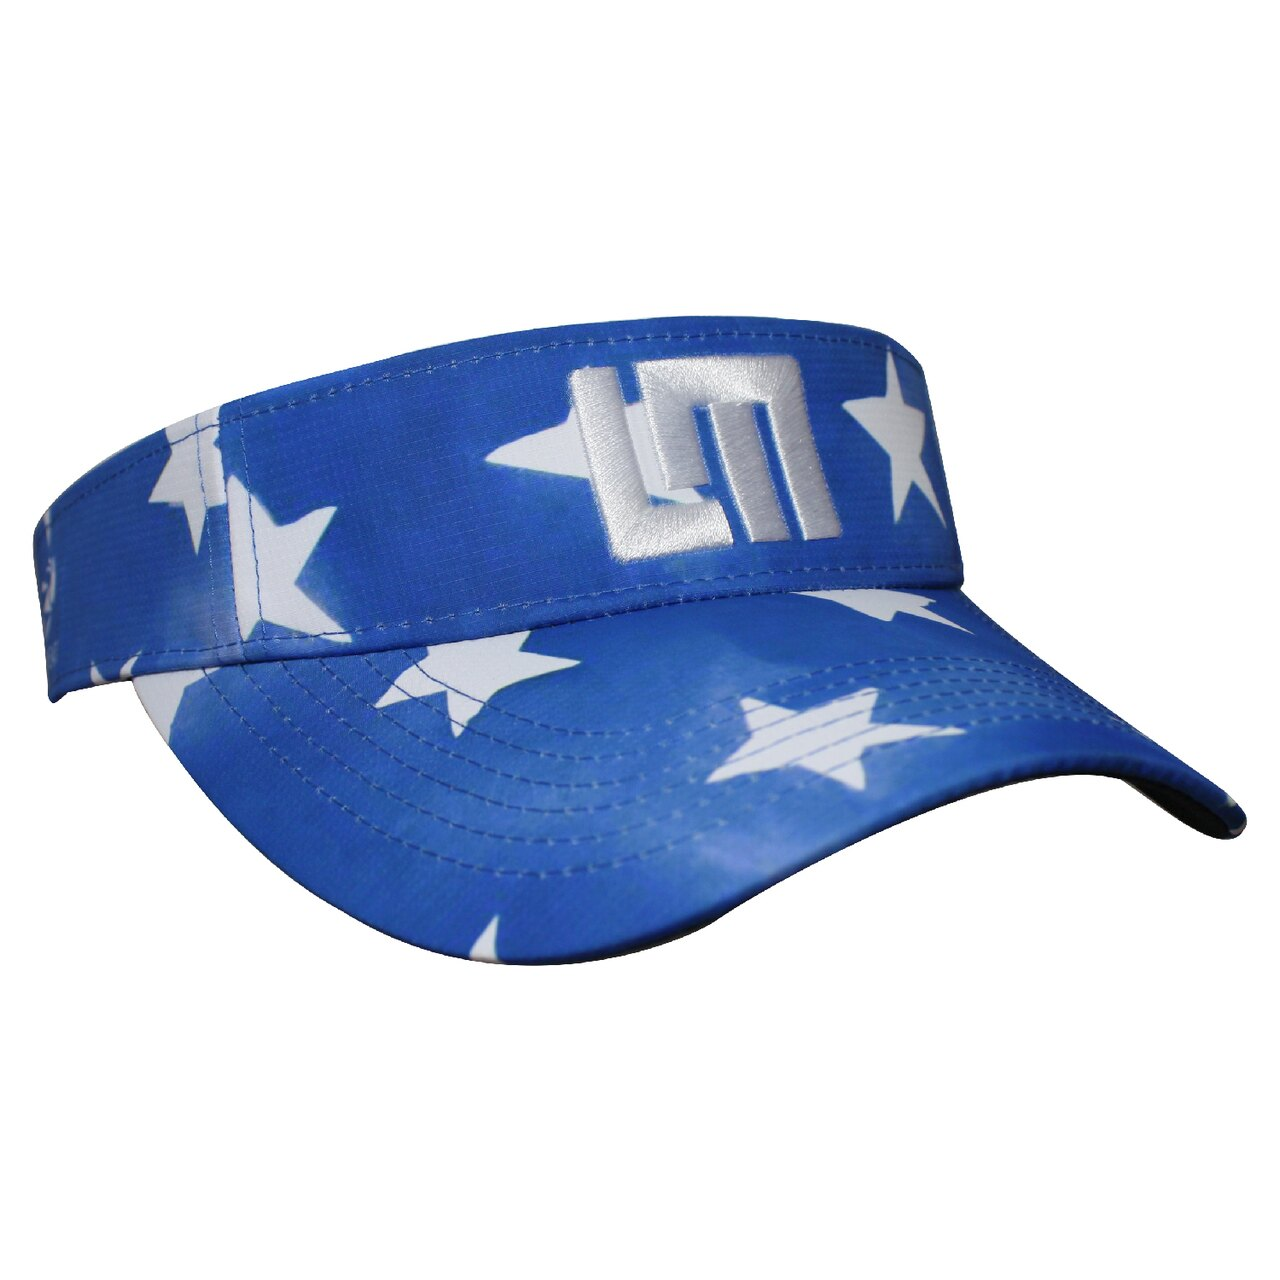 LOUDMOUTH 英國高爾夫服飾品牌-星星中空帽